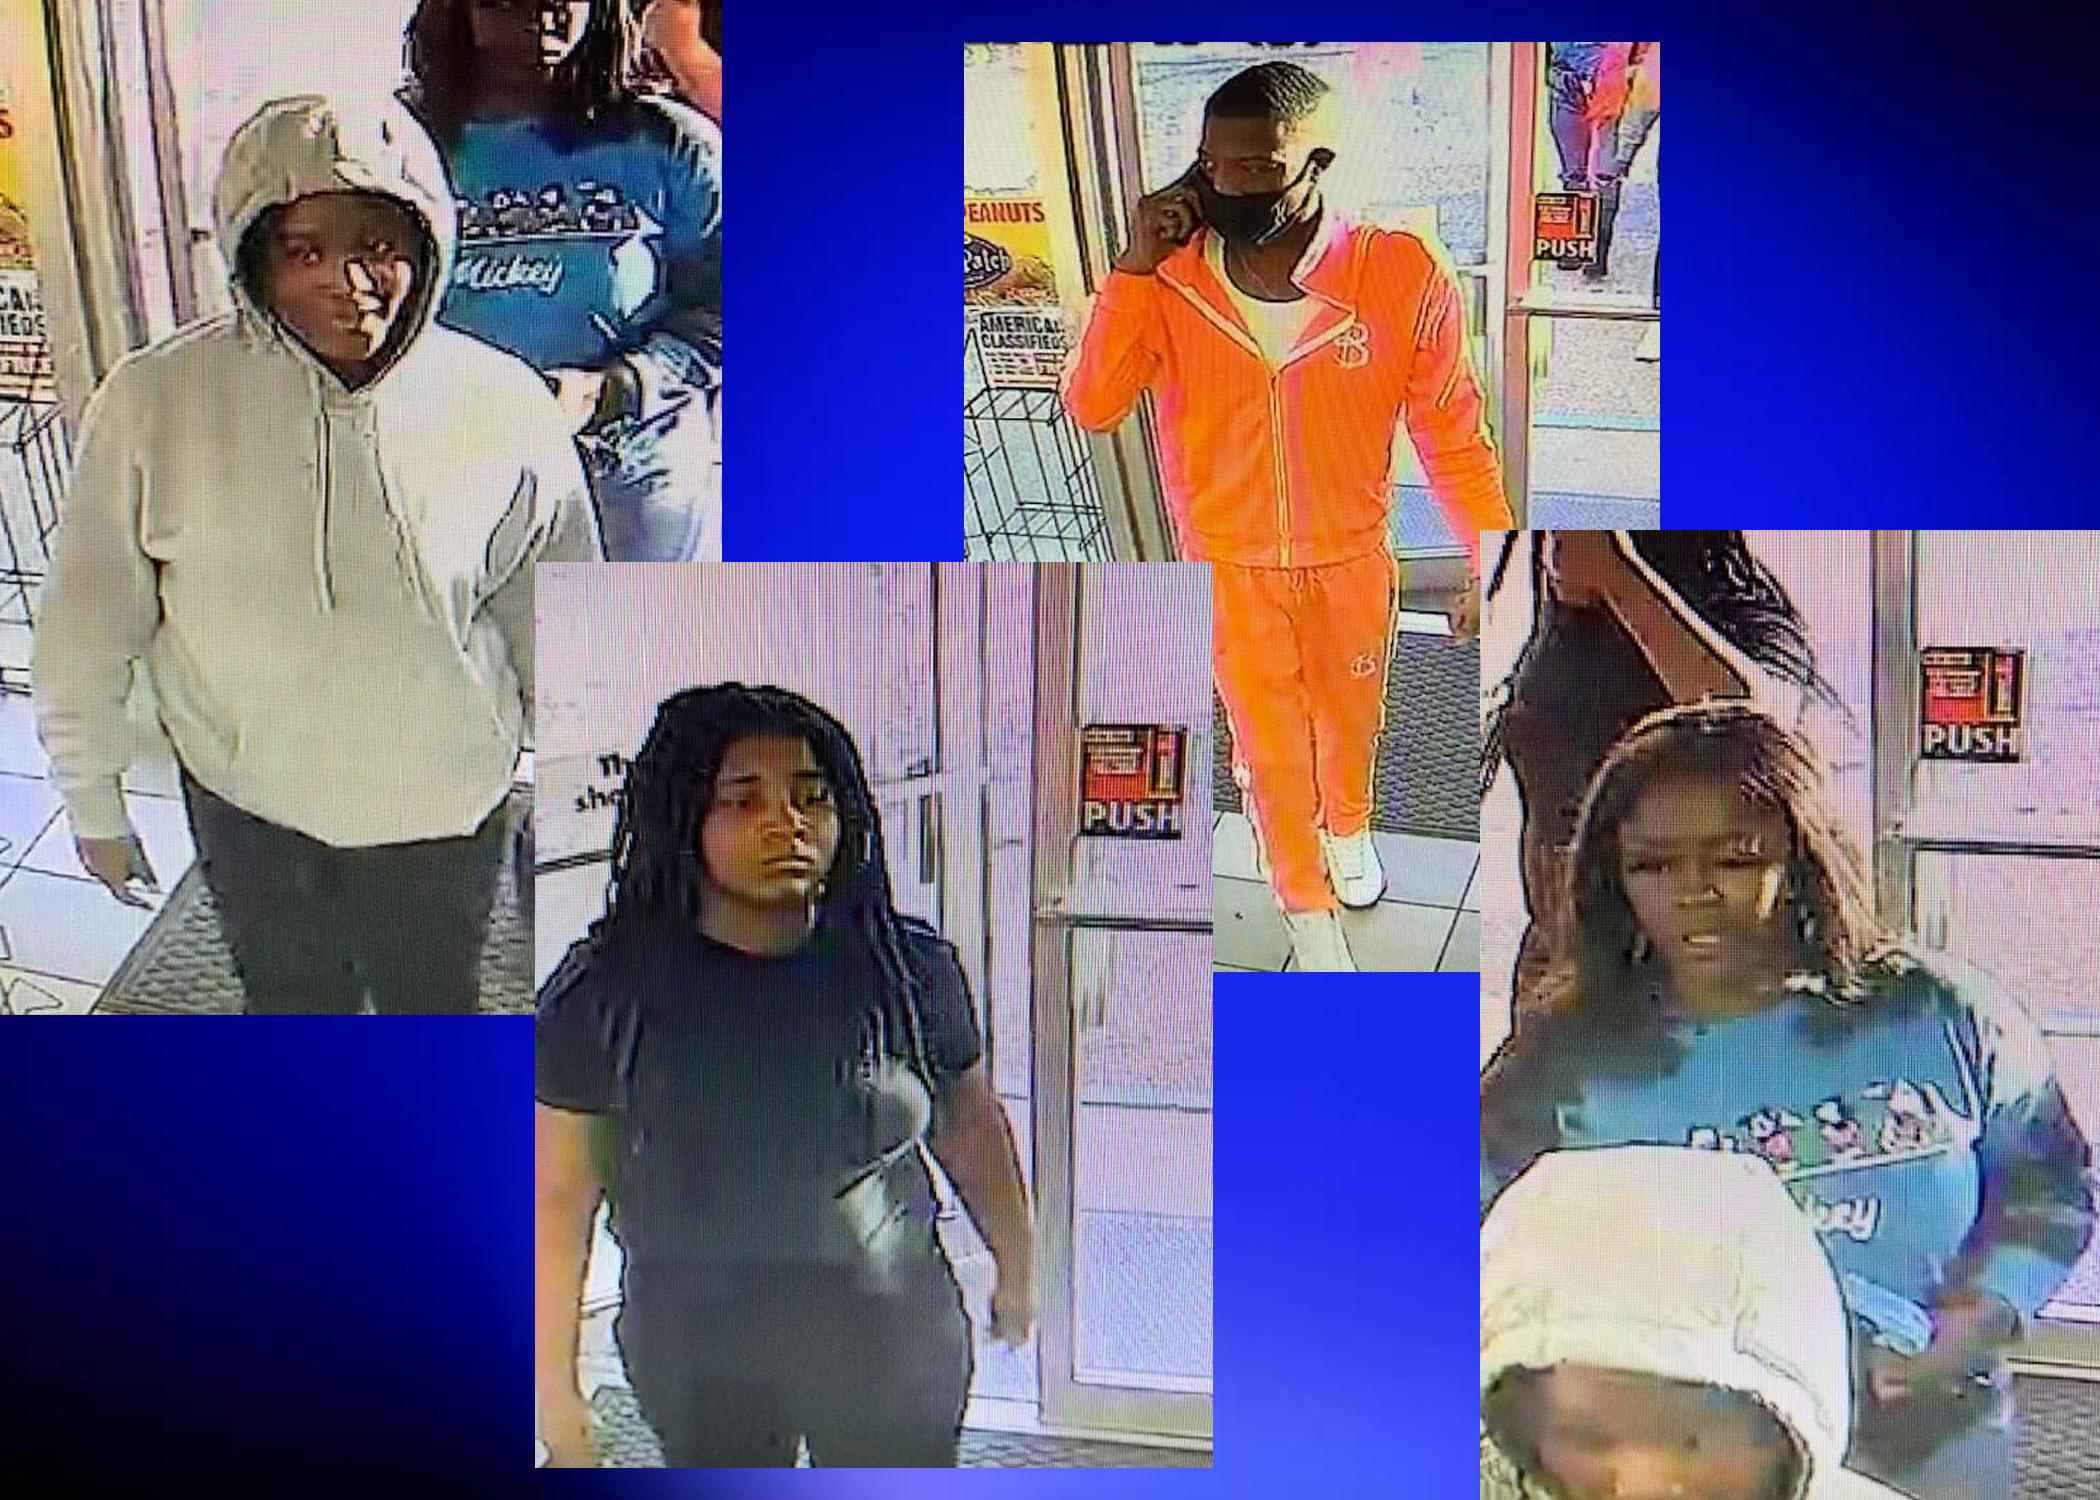 Sheriff's office asking for help in Argo store burglary